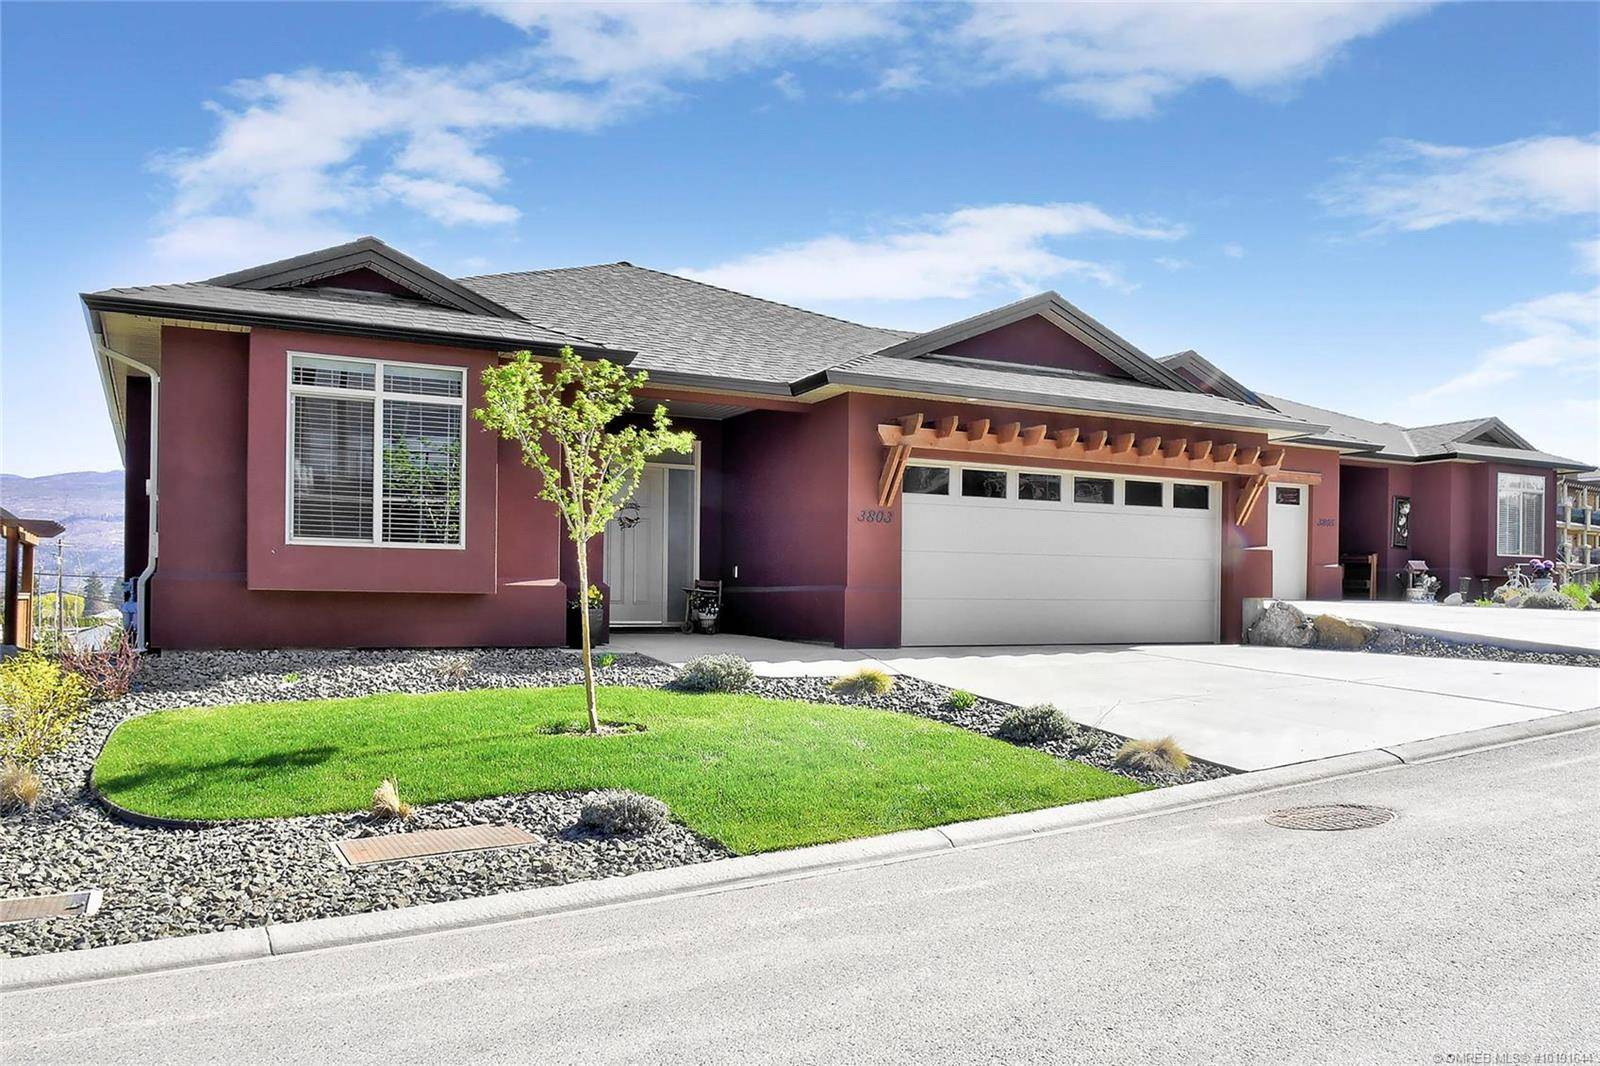 House for sale at 3803 Del Mar Ln West Kelowna British Columbia - MLS: 10191644